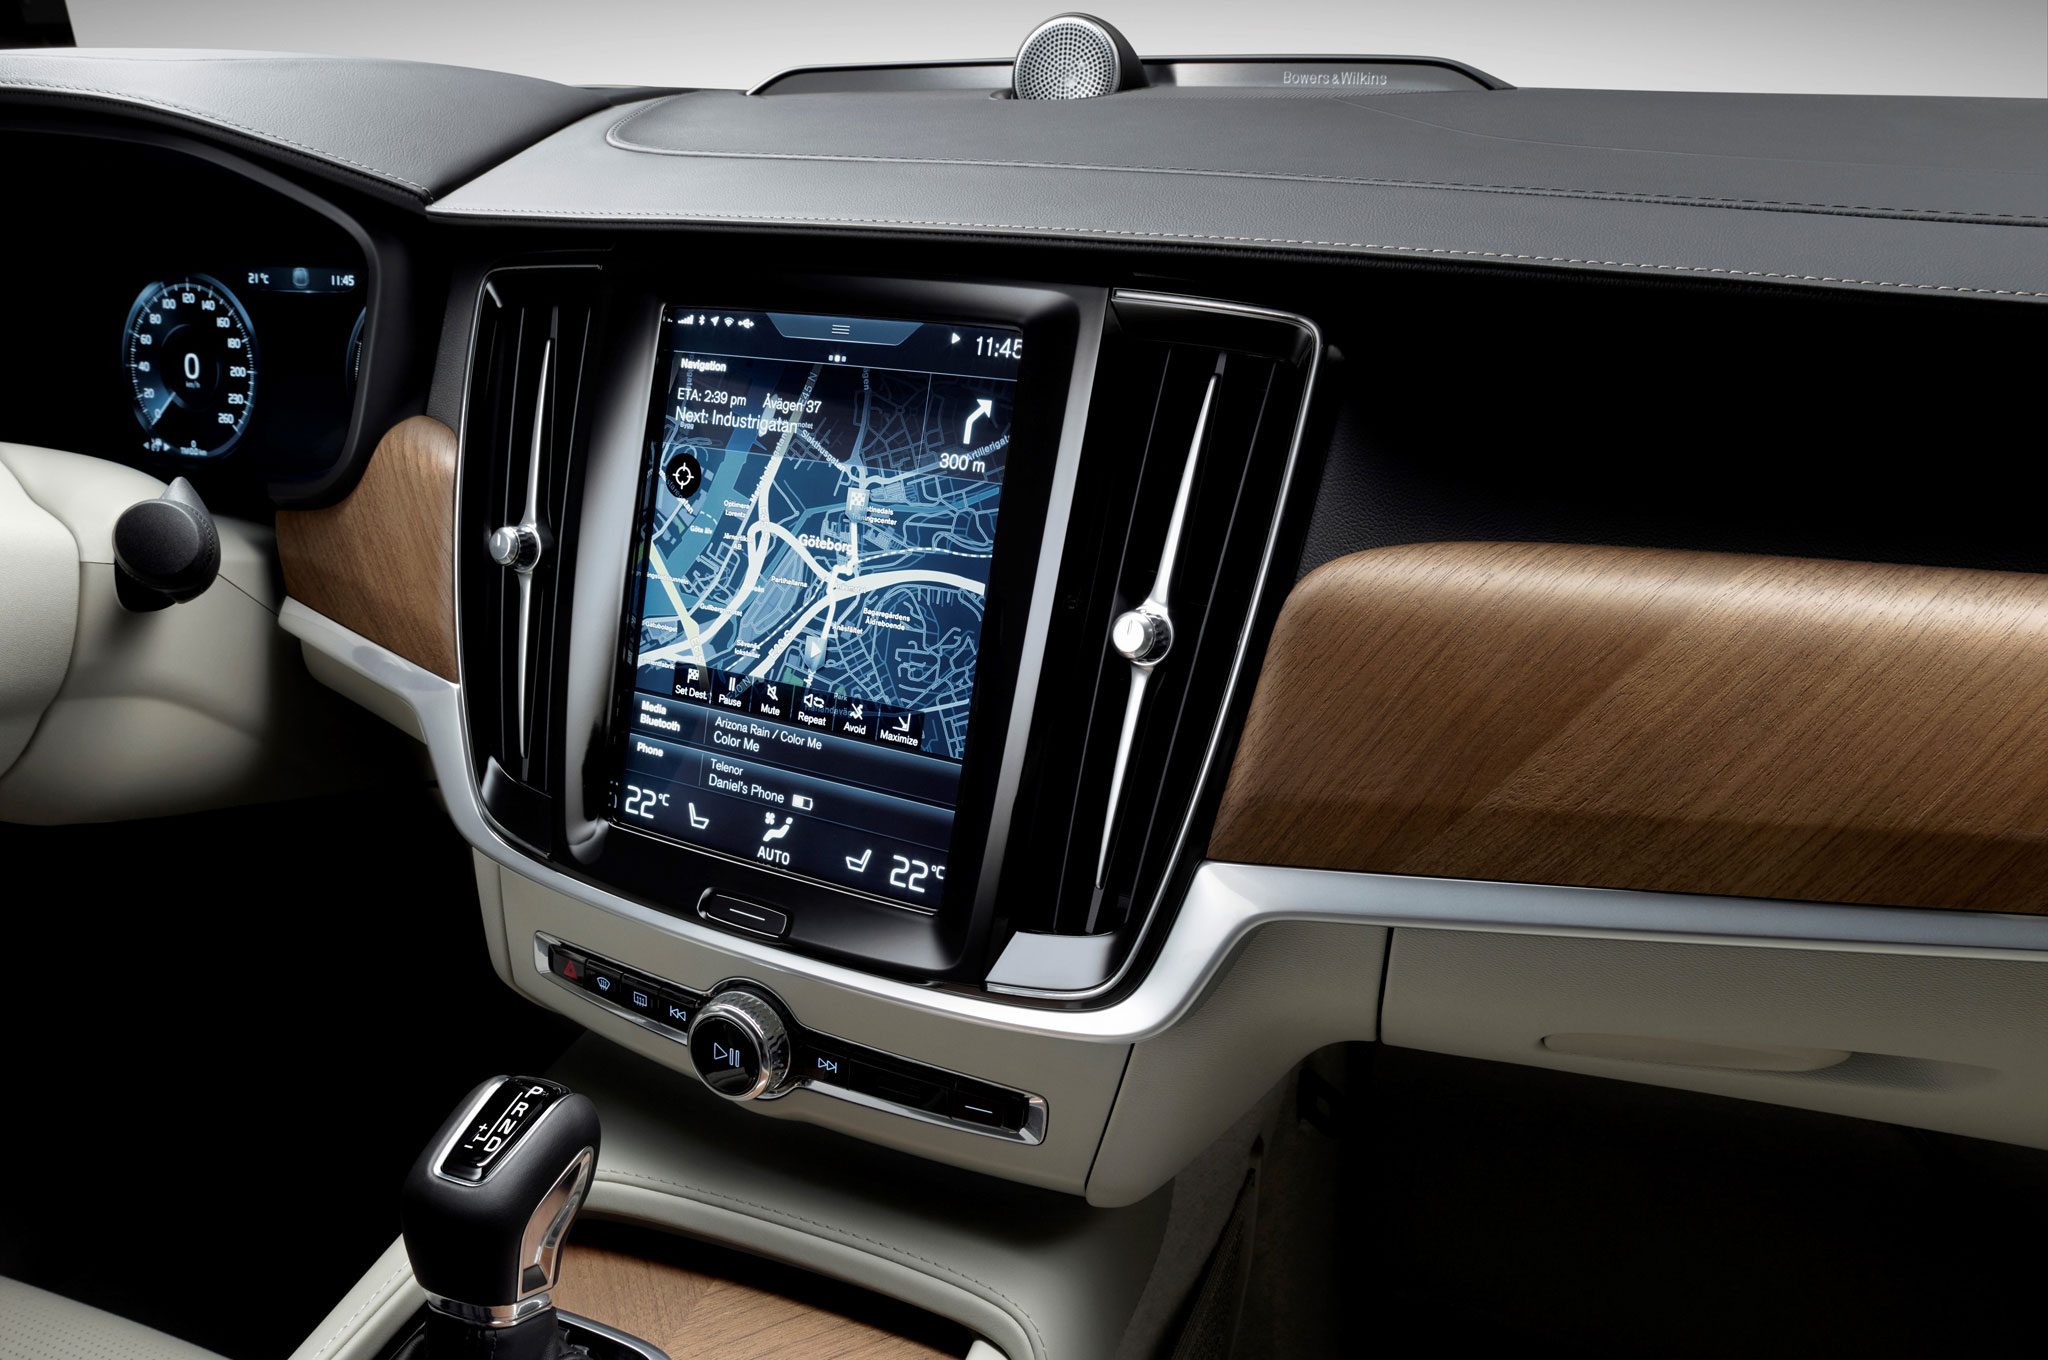 2018 volvo s90 interior.  2018 within  to 2018 volvo s90 interior